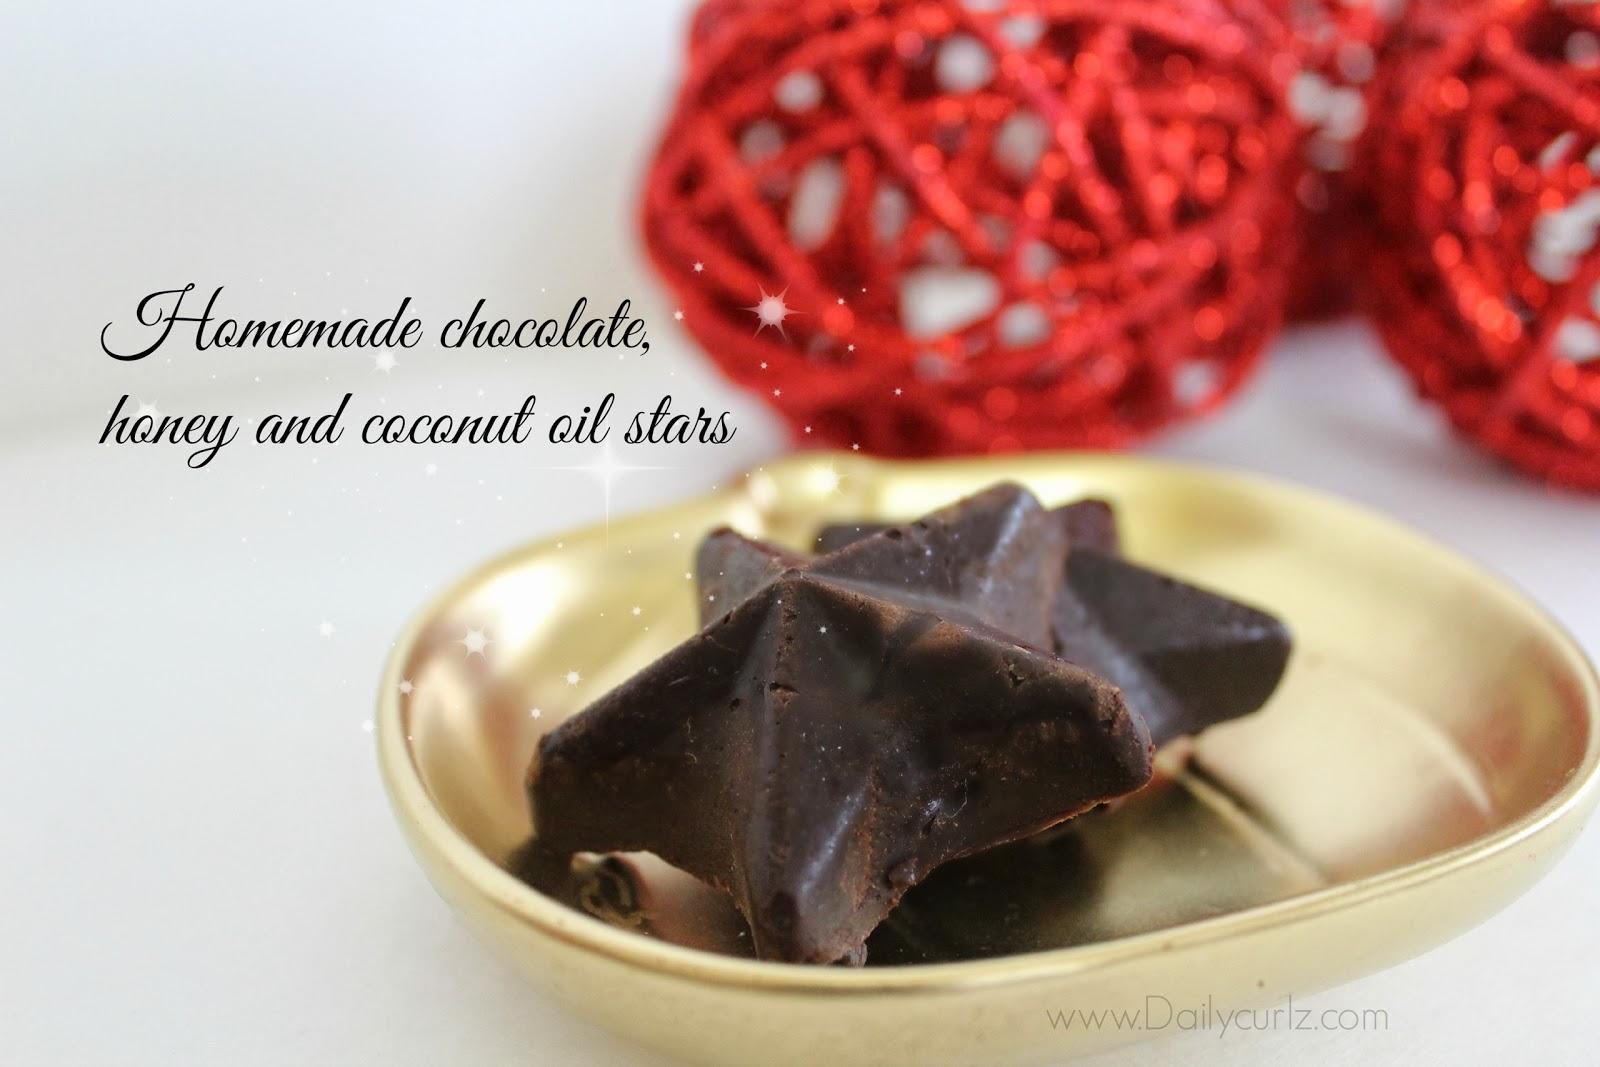 how to use cacao powder to make chocolate